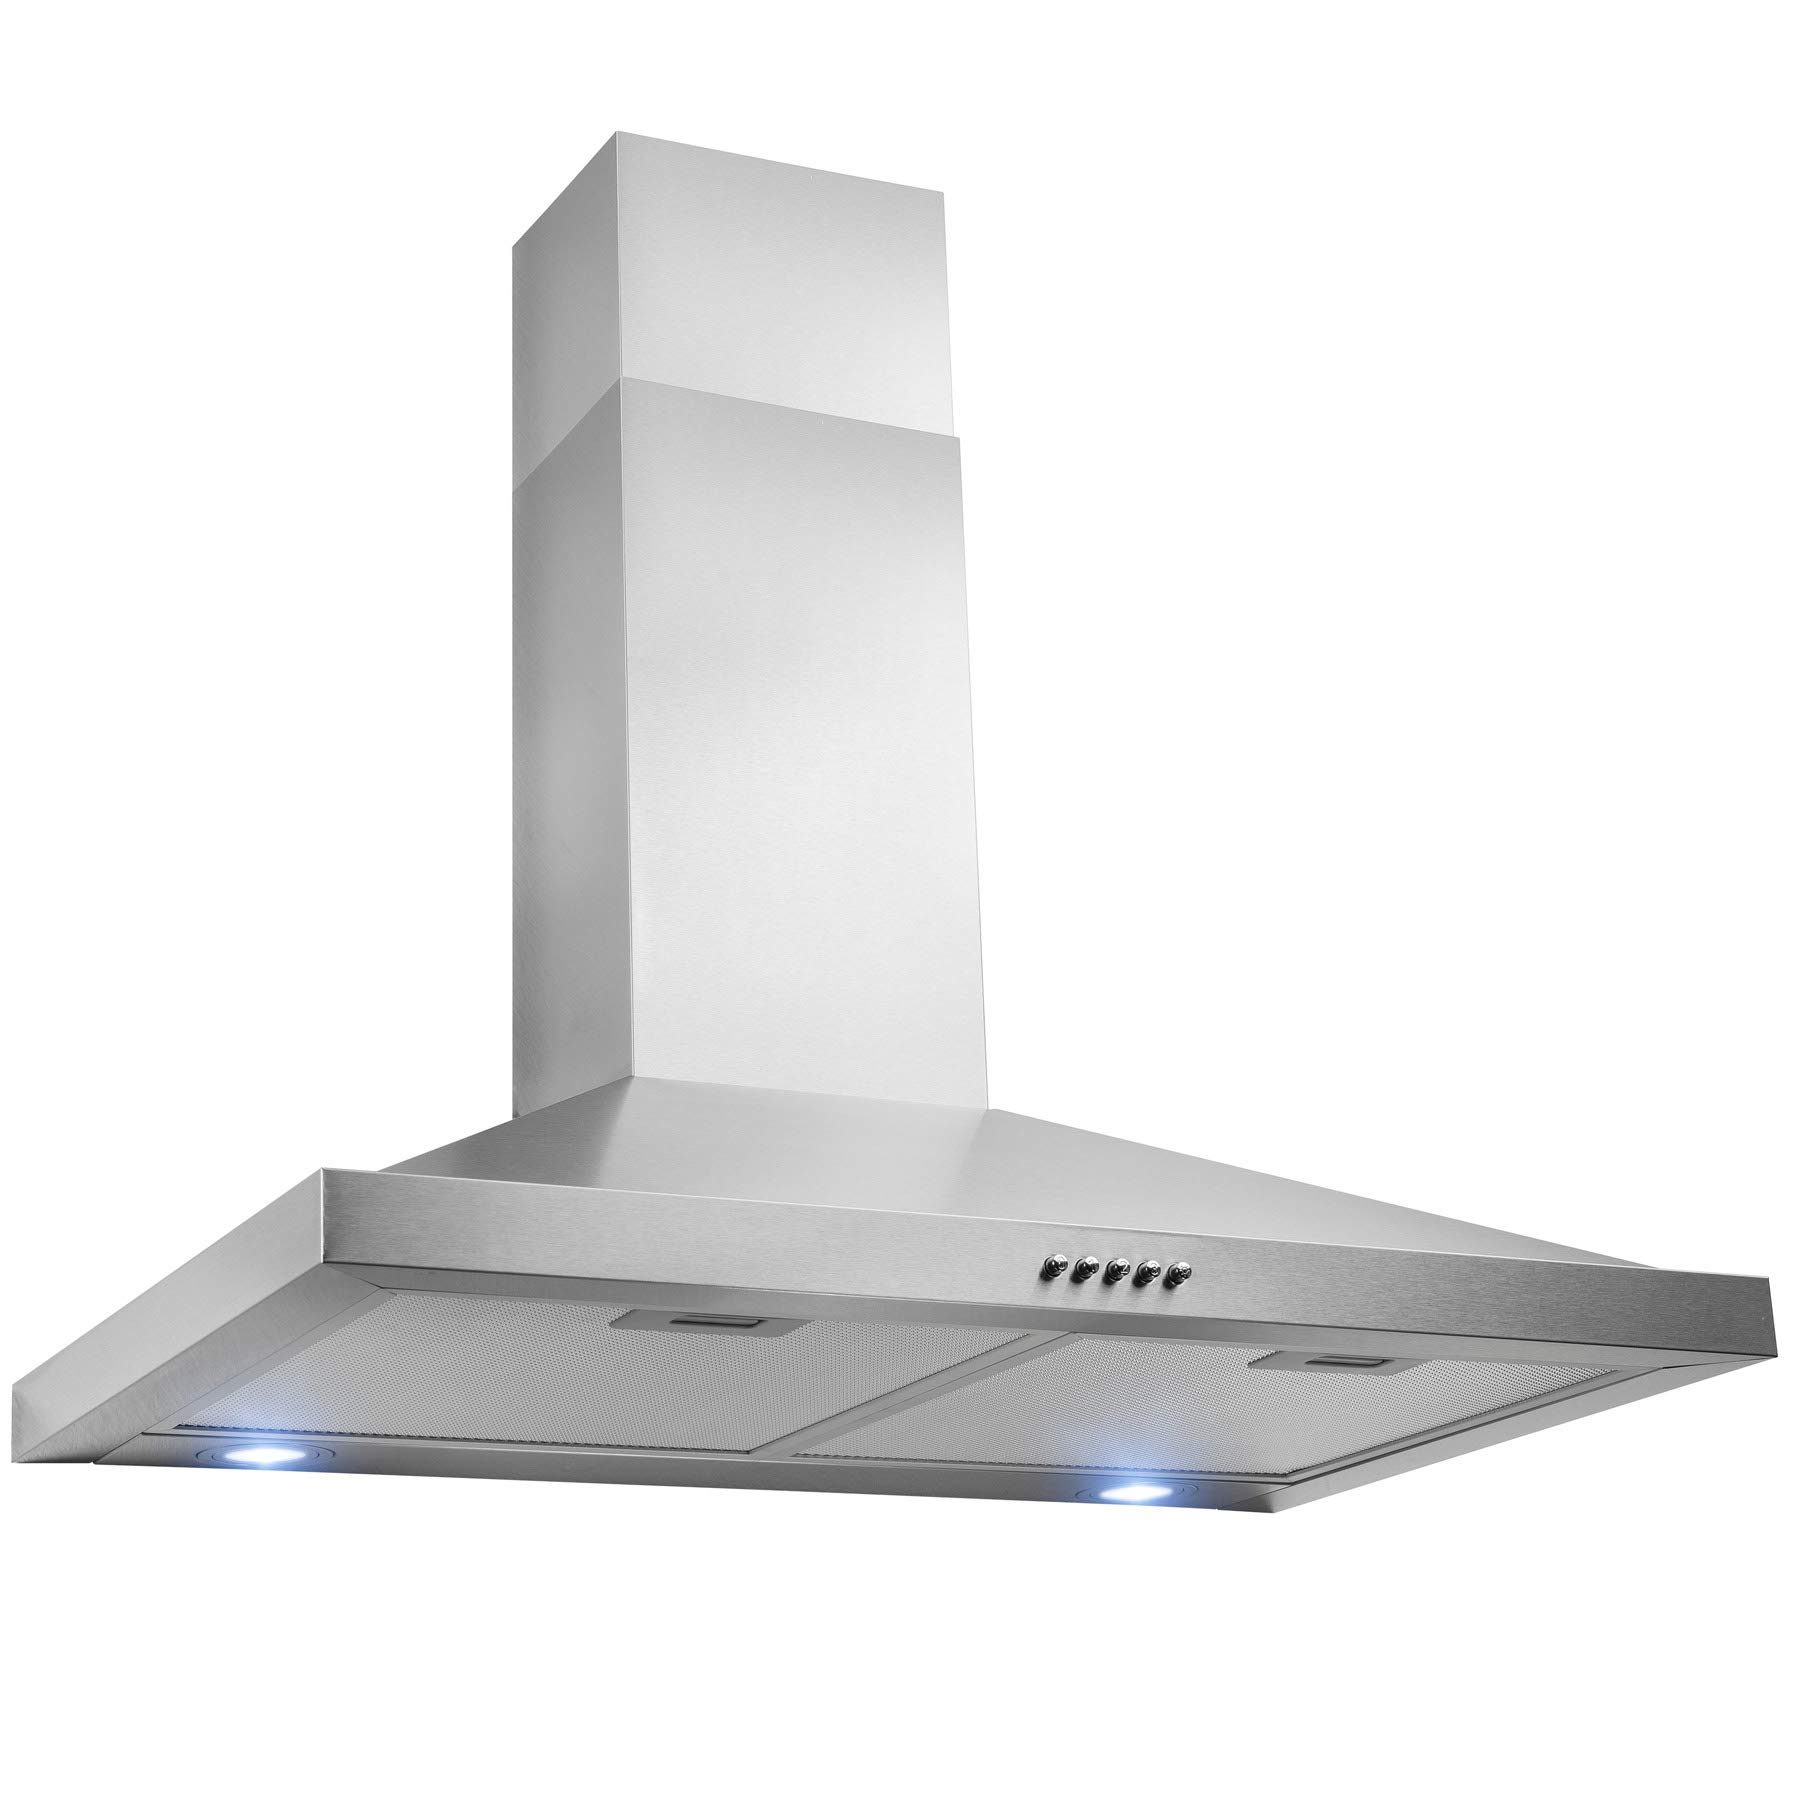 FIREBIRD 30'' Wall Mount Stainless Steel Push Panel Kitchen Range Hood Cooking Fan